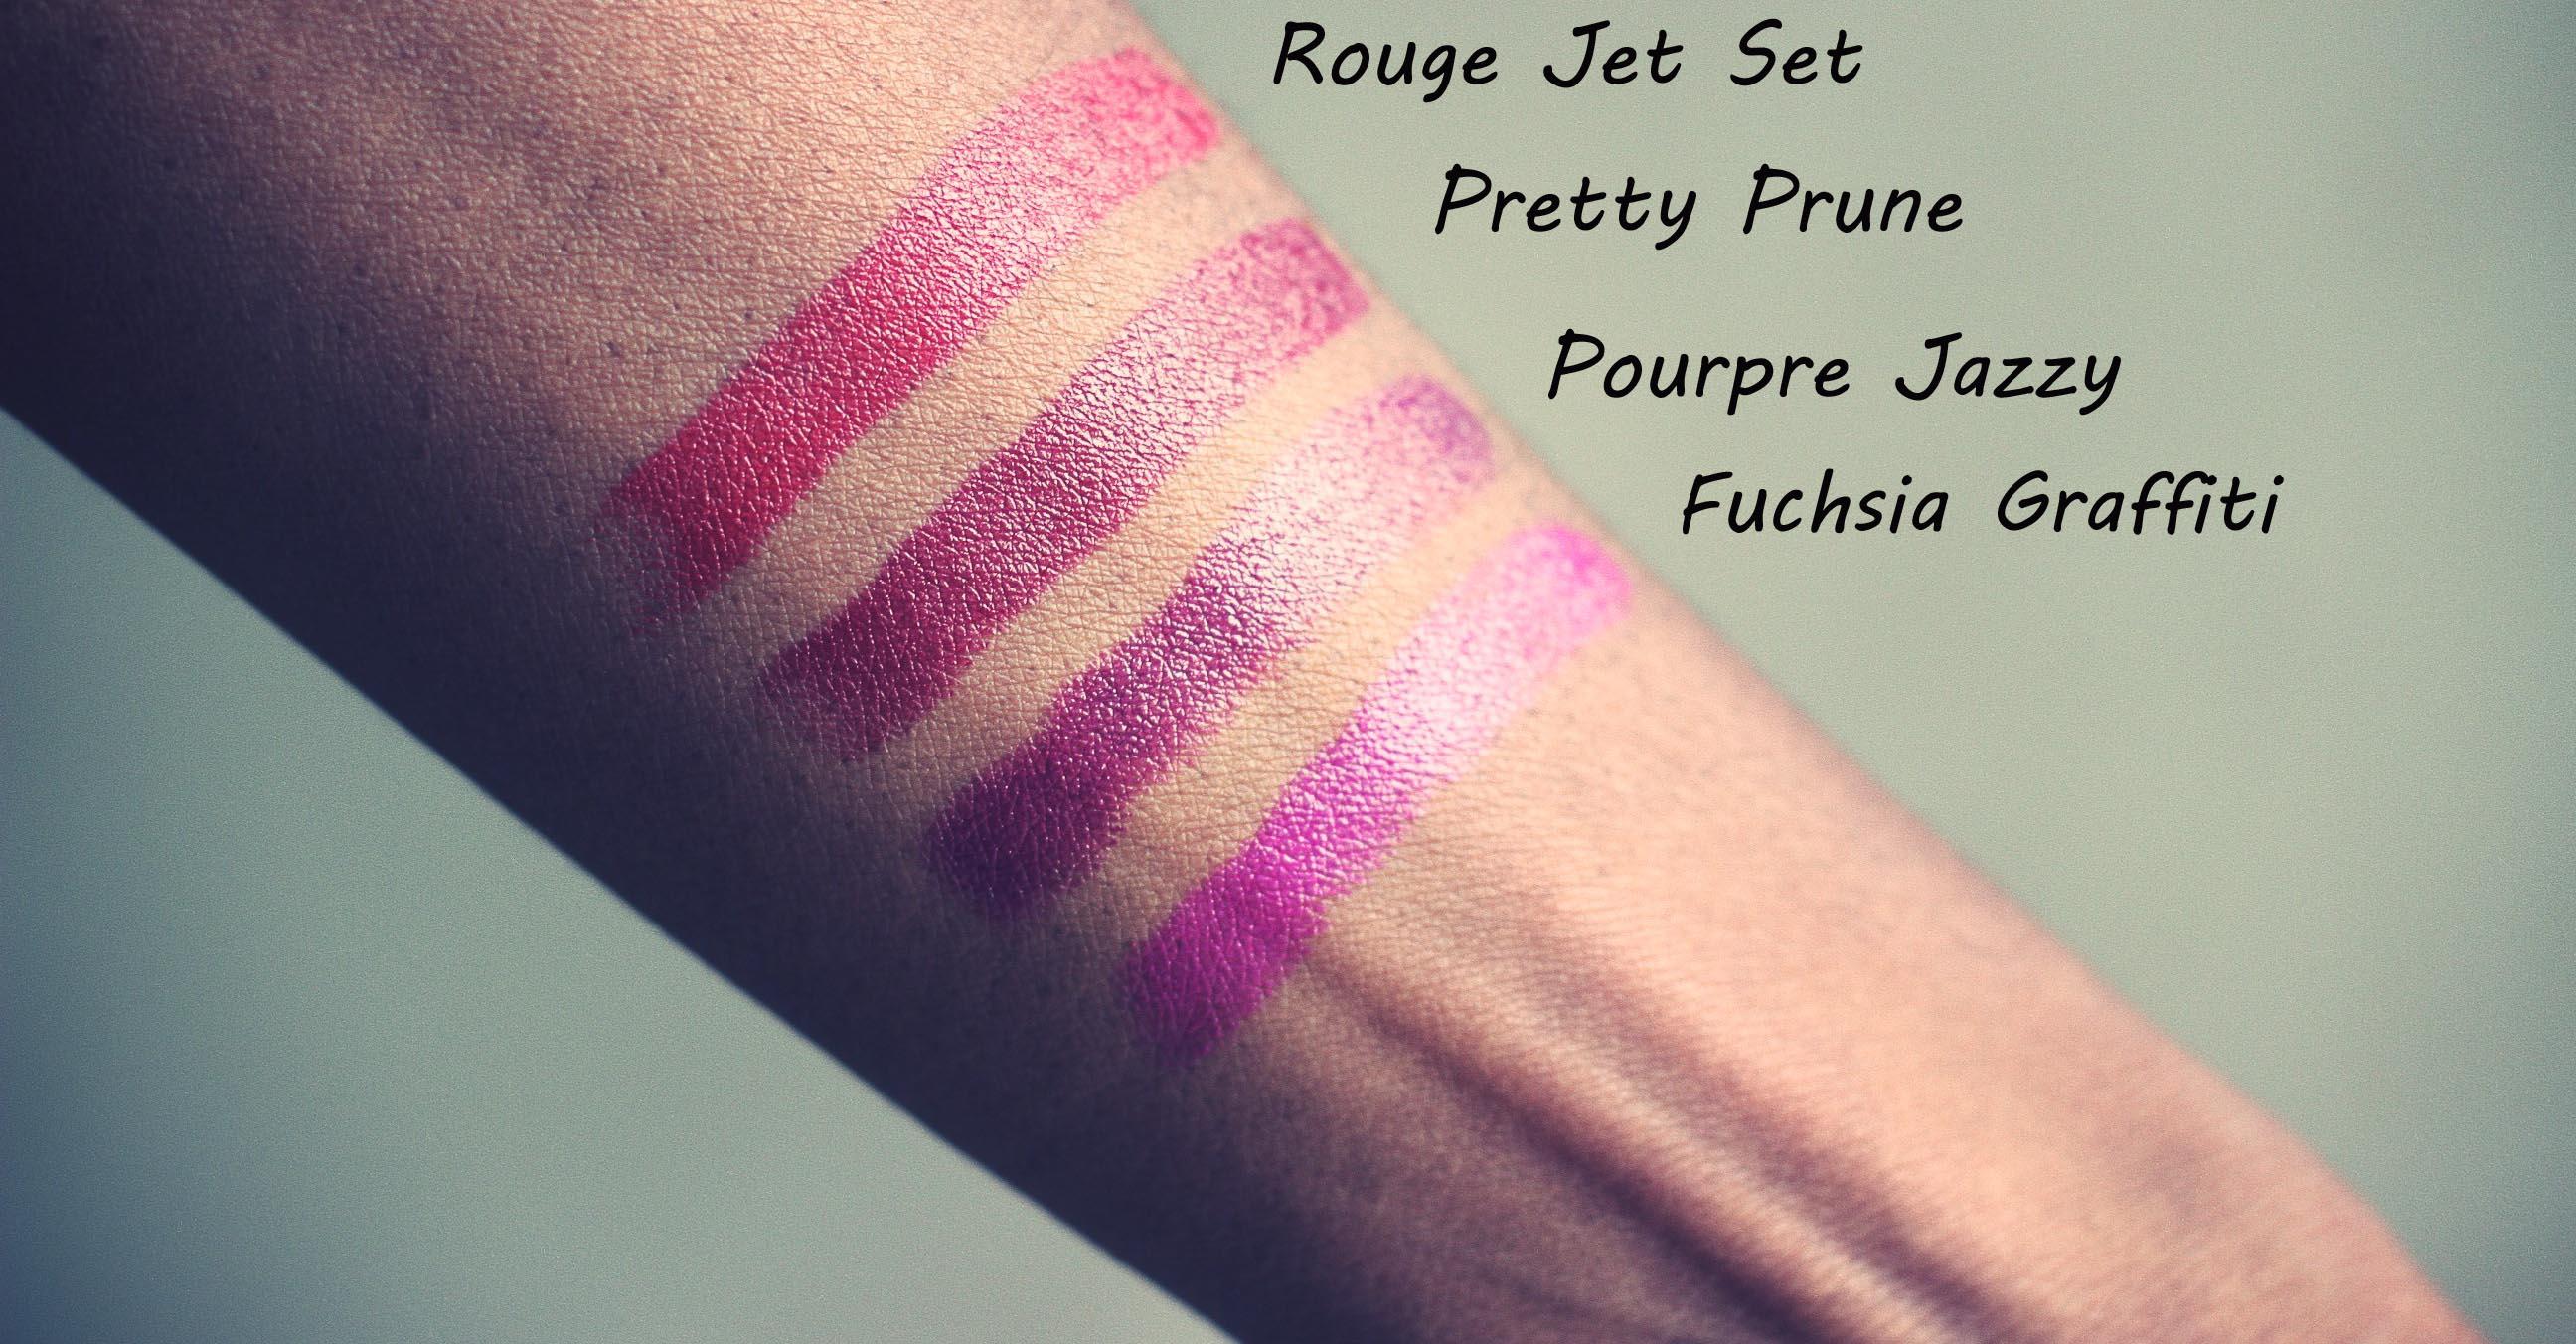 nunaavane-bblogger-beauty-finds-bourjois-rouge-edition-lipsticks-ctbb5